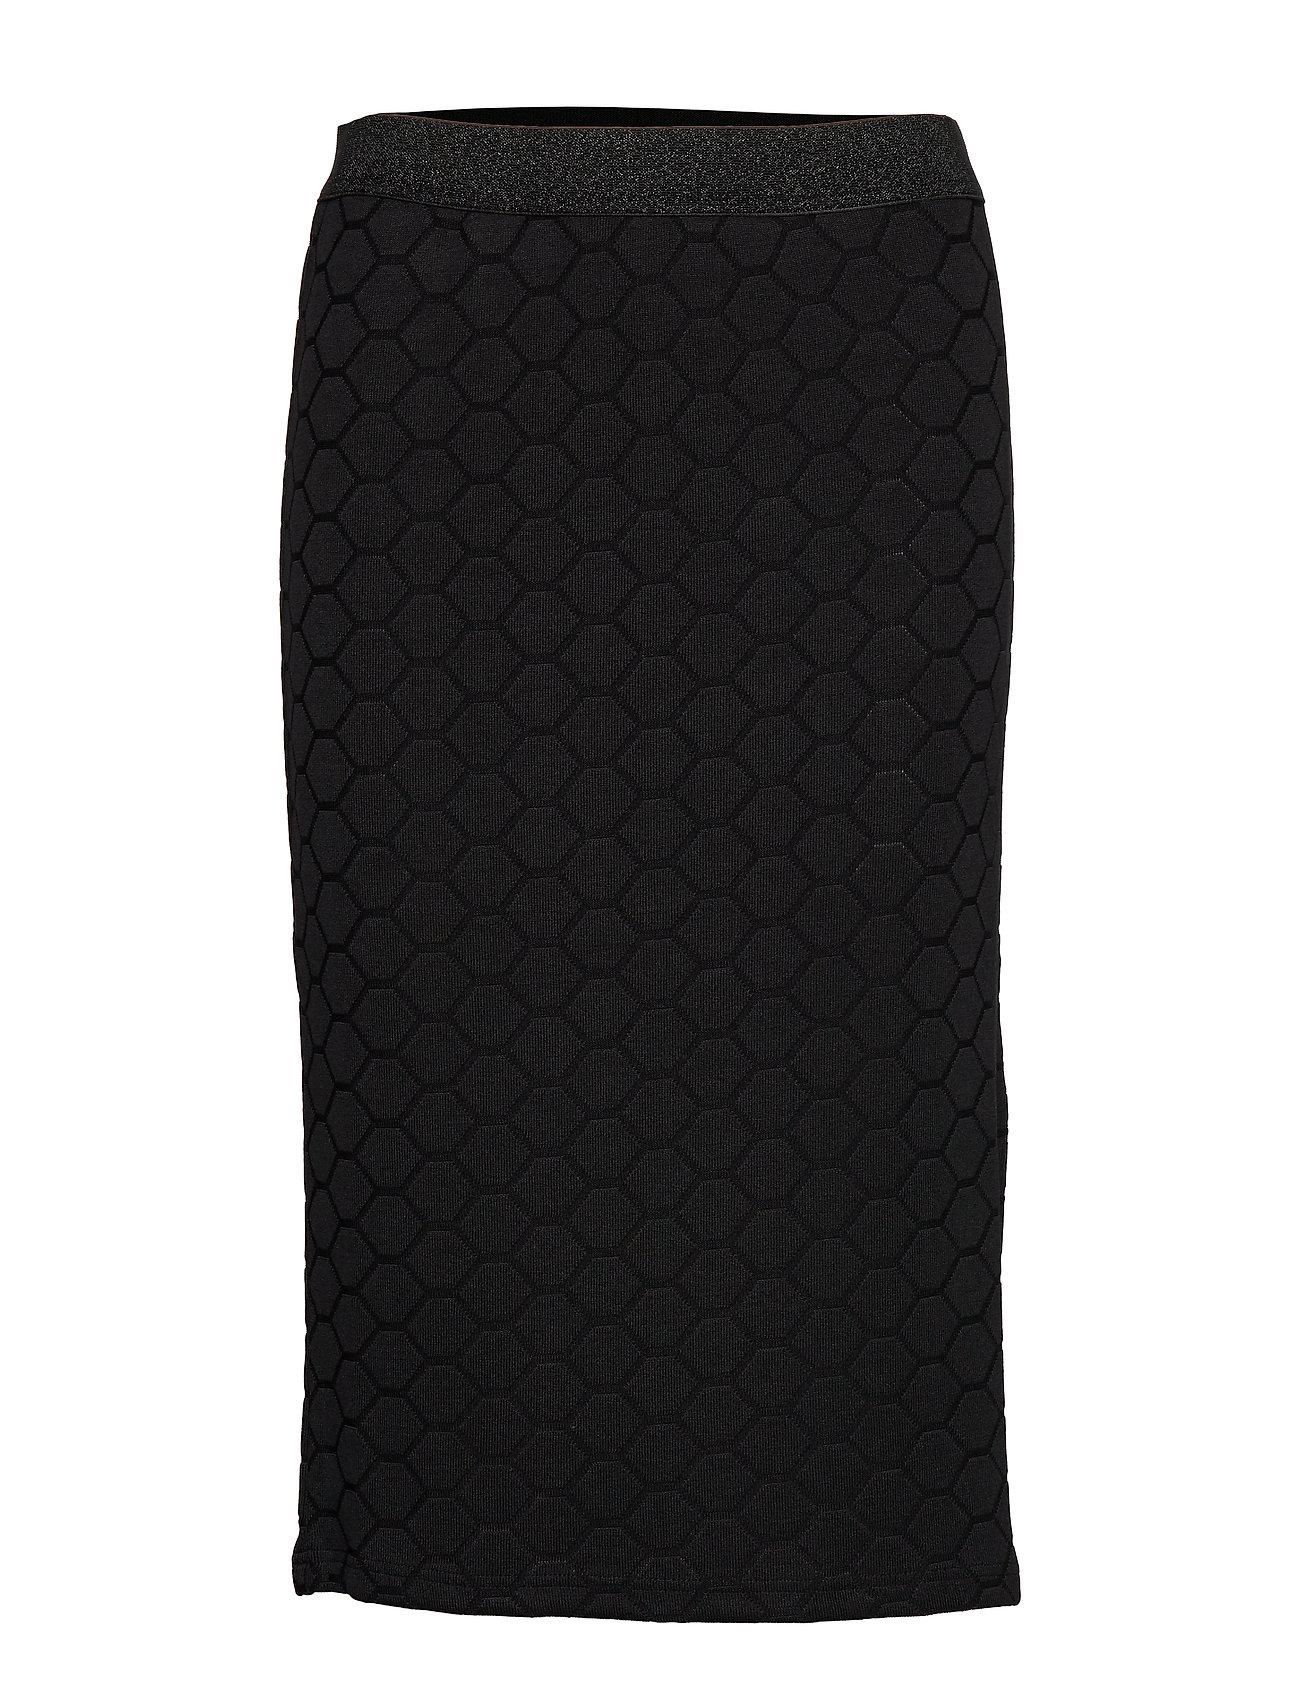 Sofie Schnoor Skirt - BLACK